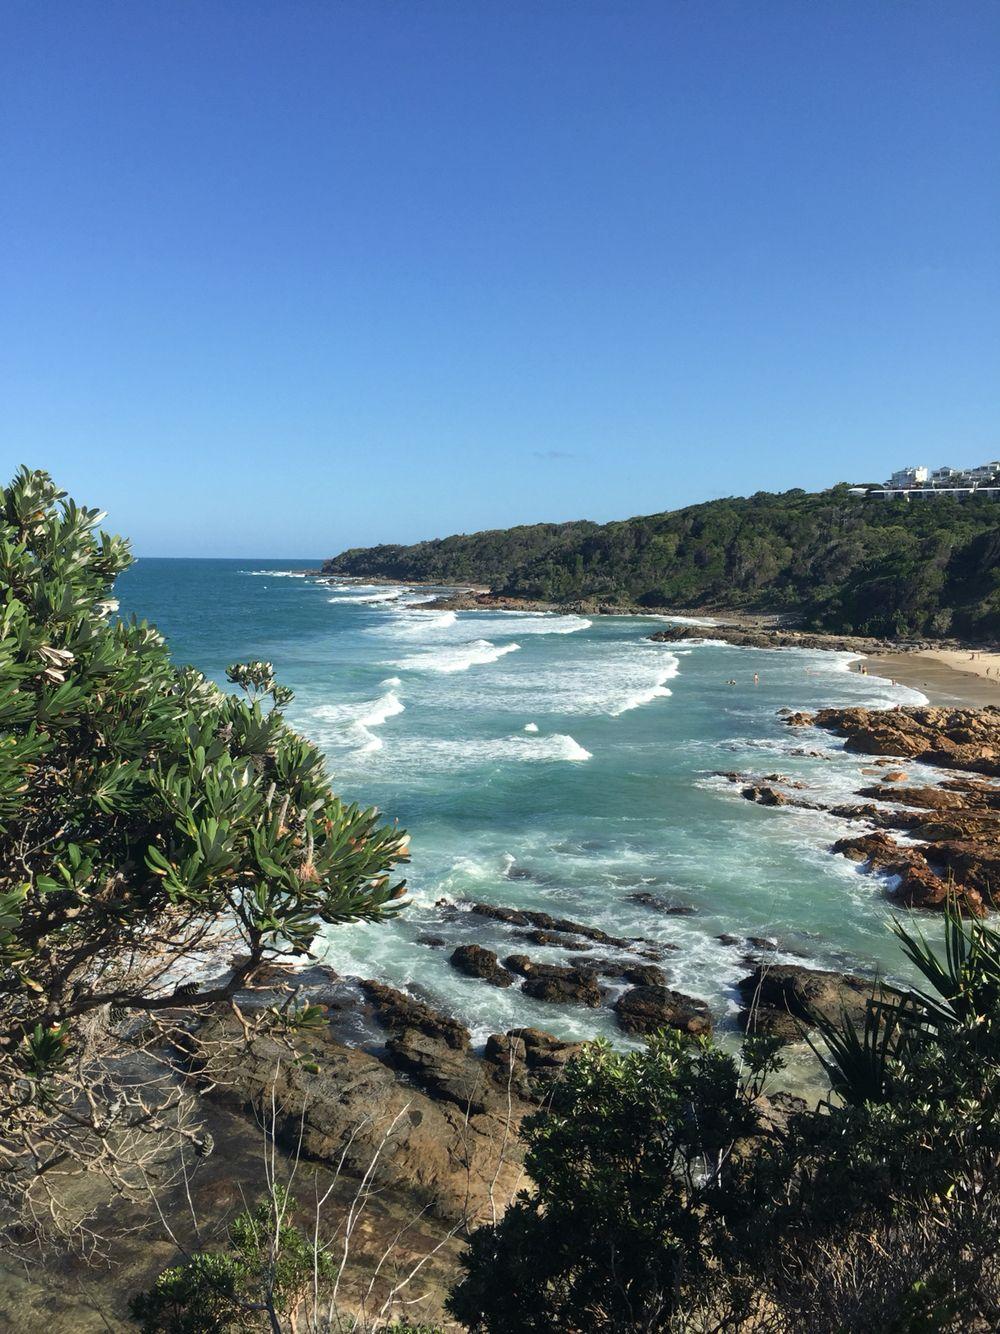 Coolum Beach Park, Coolum Beach, Sunshine Coast